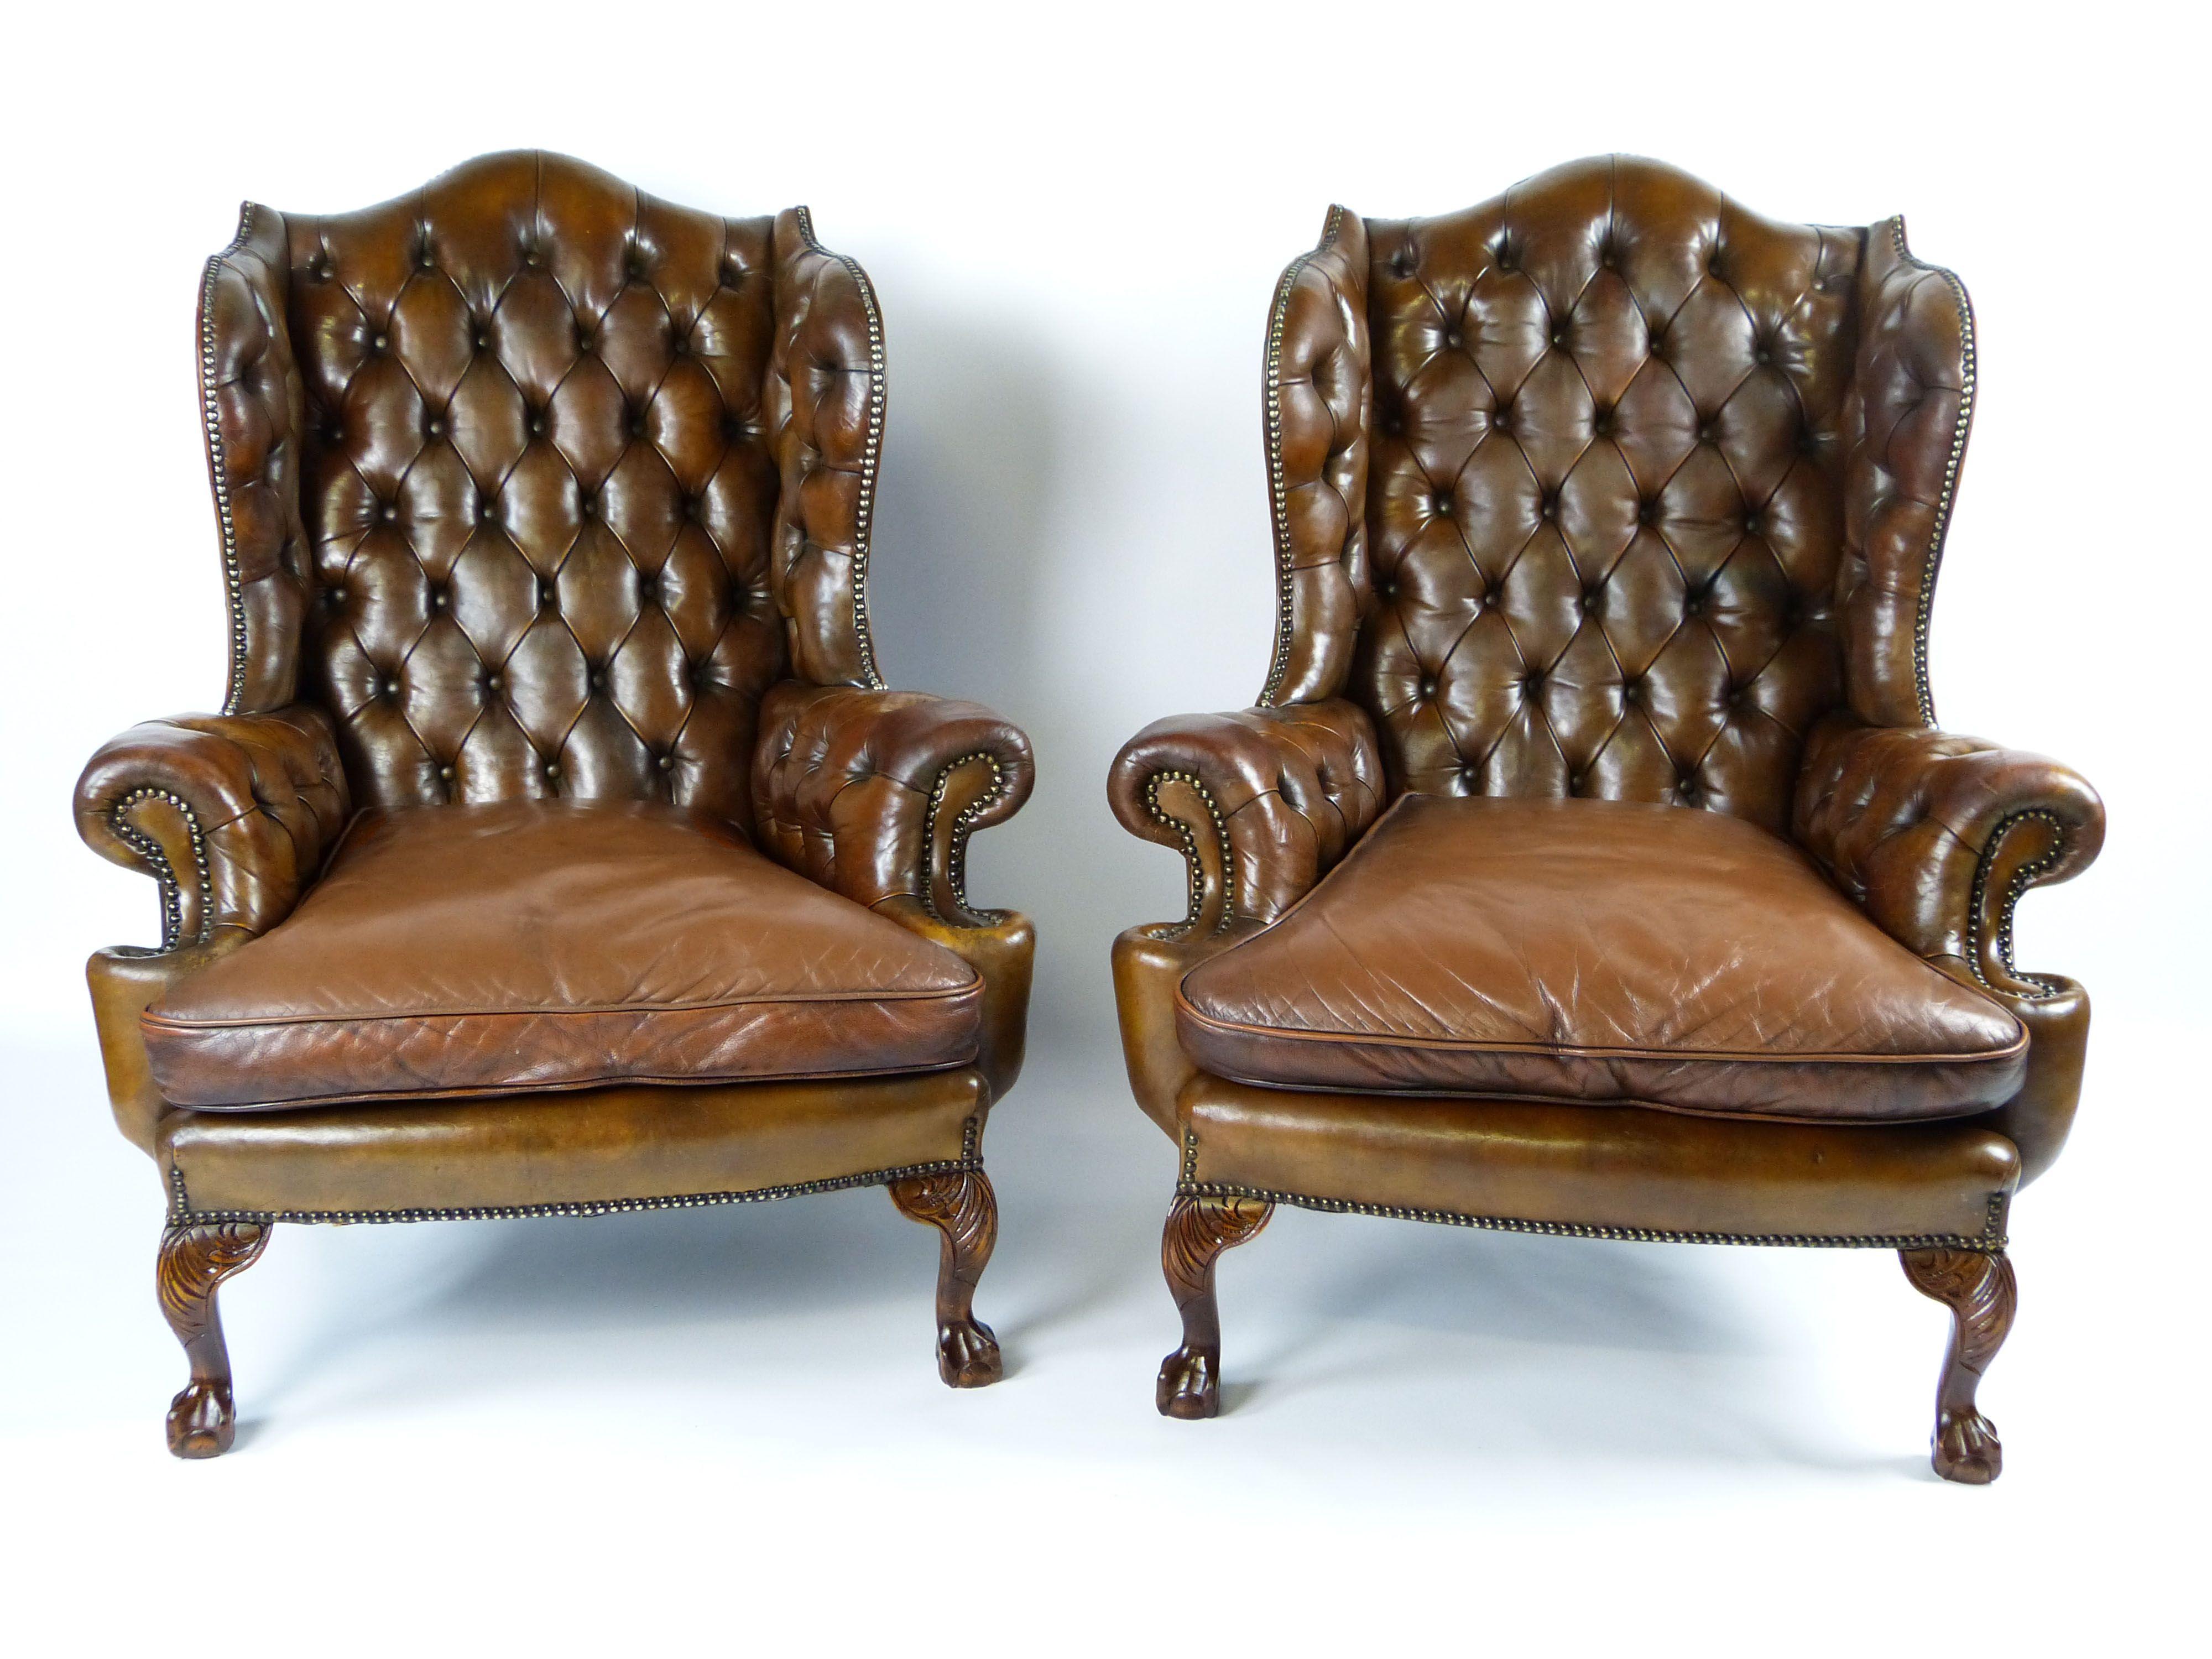 Muebles antiguos armarios antiguos mesas antiguas for Muebles sillones sofas